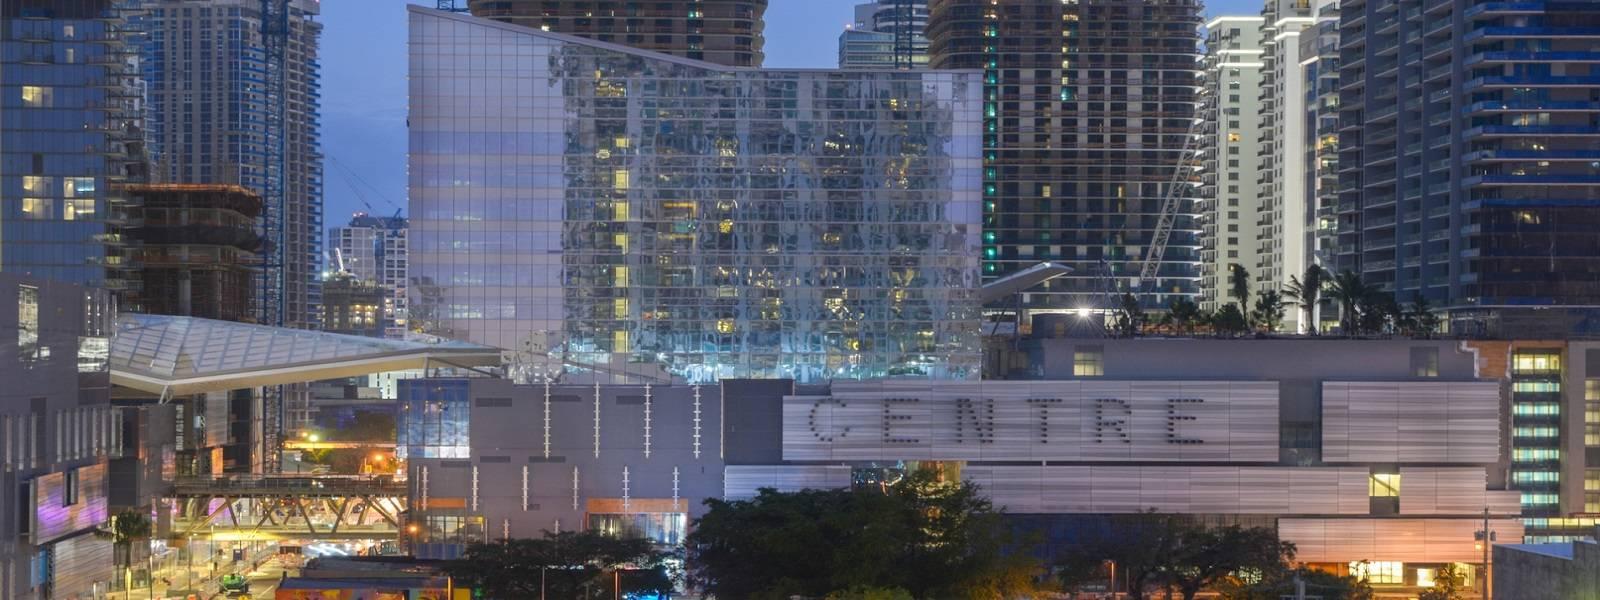 Two-Brickell-City-Centre